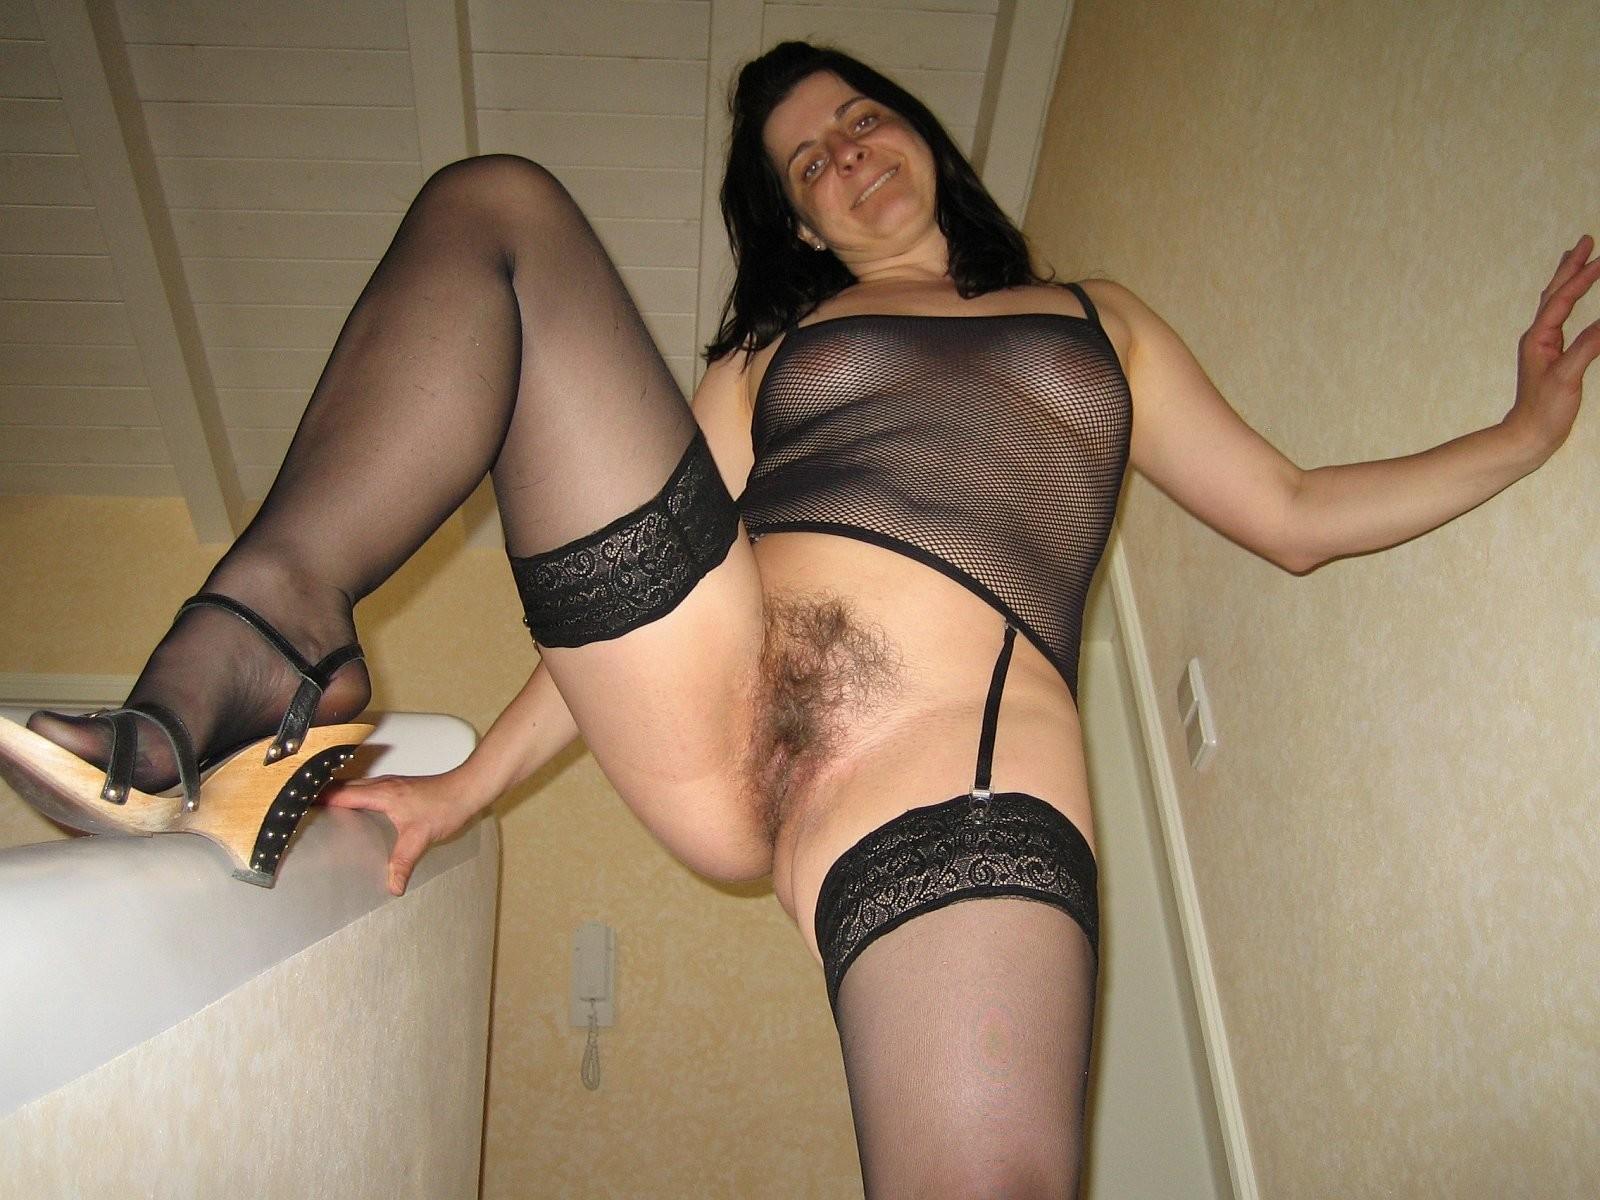 Хочу порно женщин в чулках